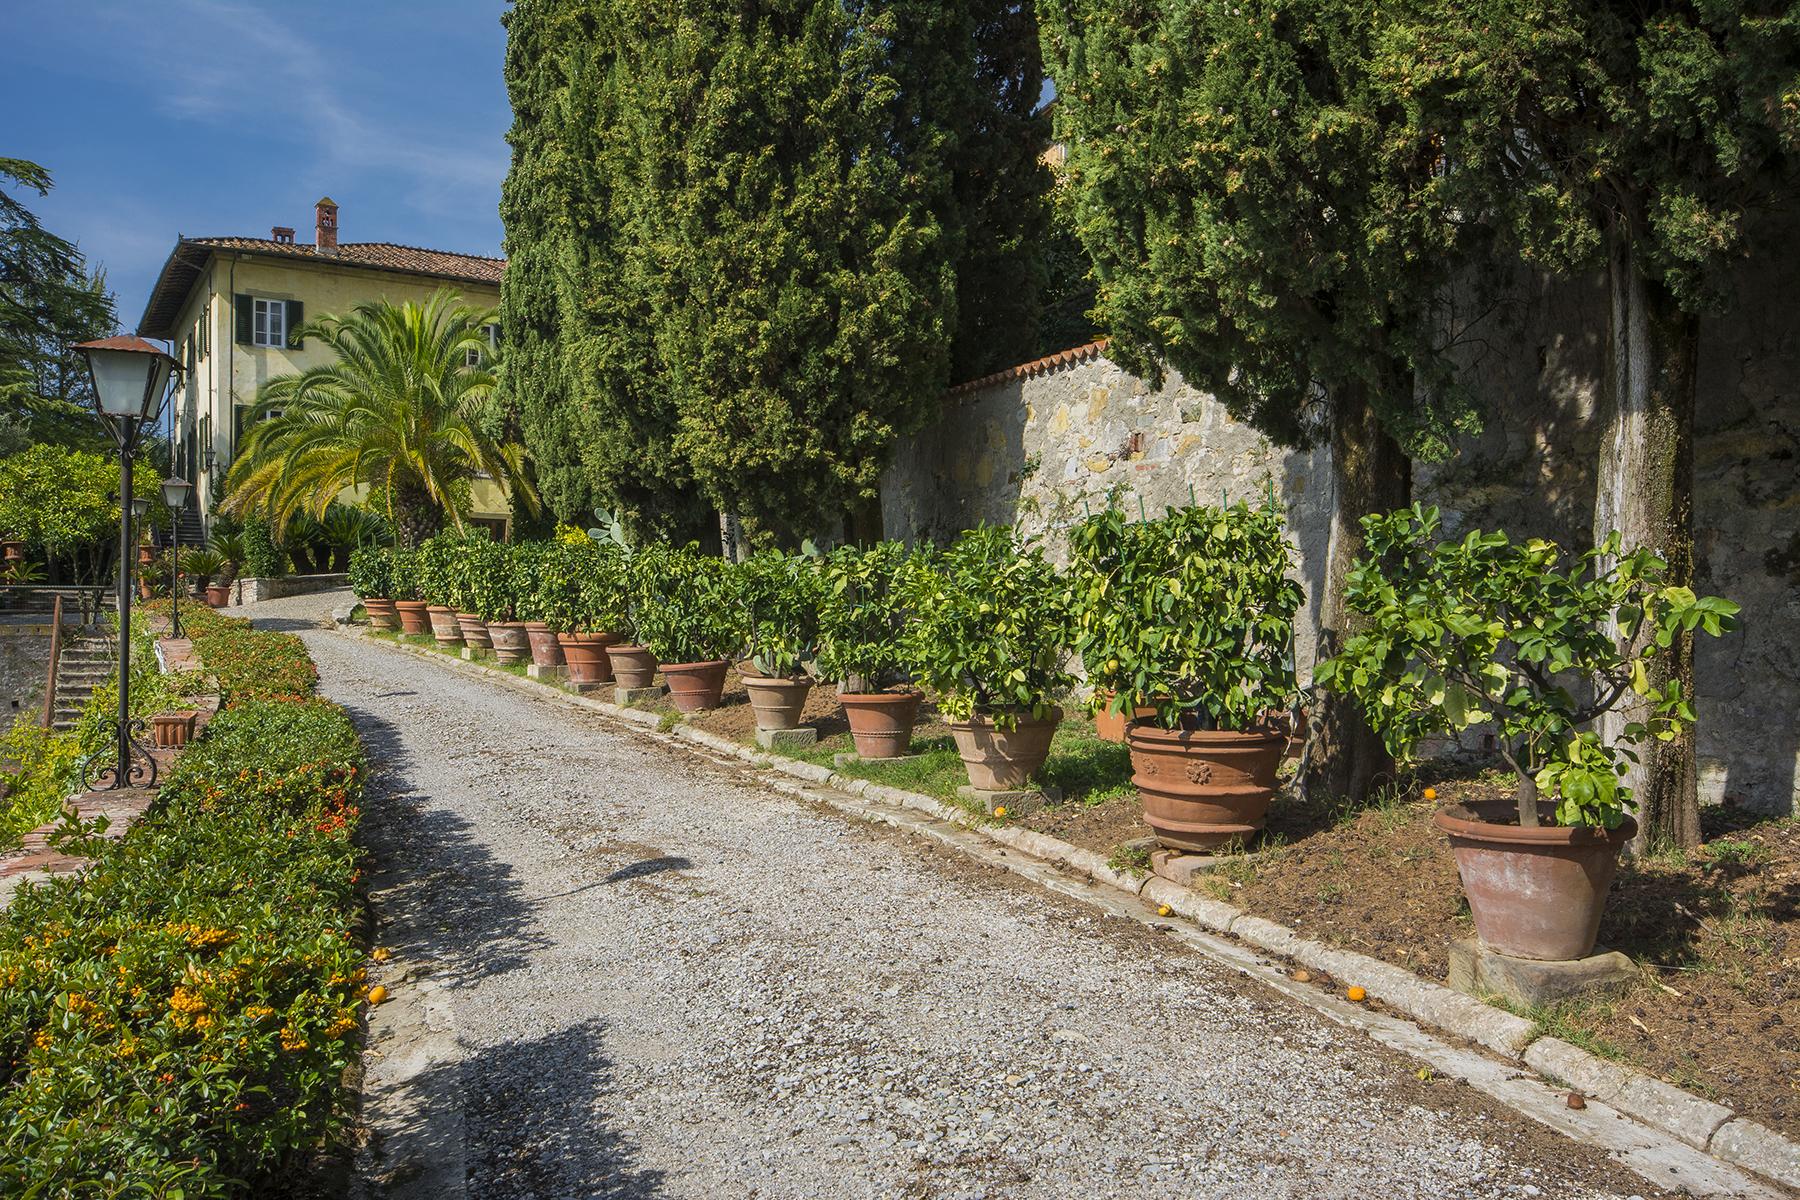 Villa in Vendita a Lucca: 5 locali, 1210 mq - Foto 2